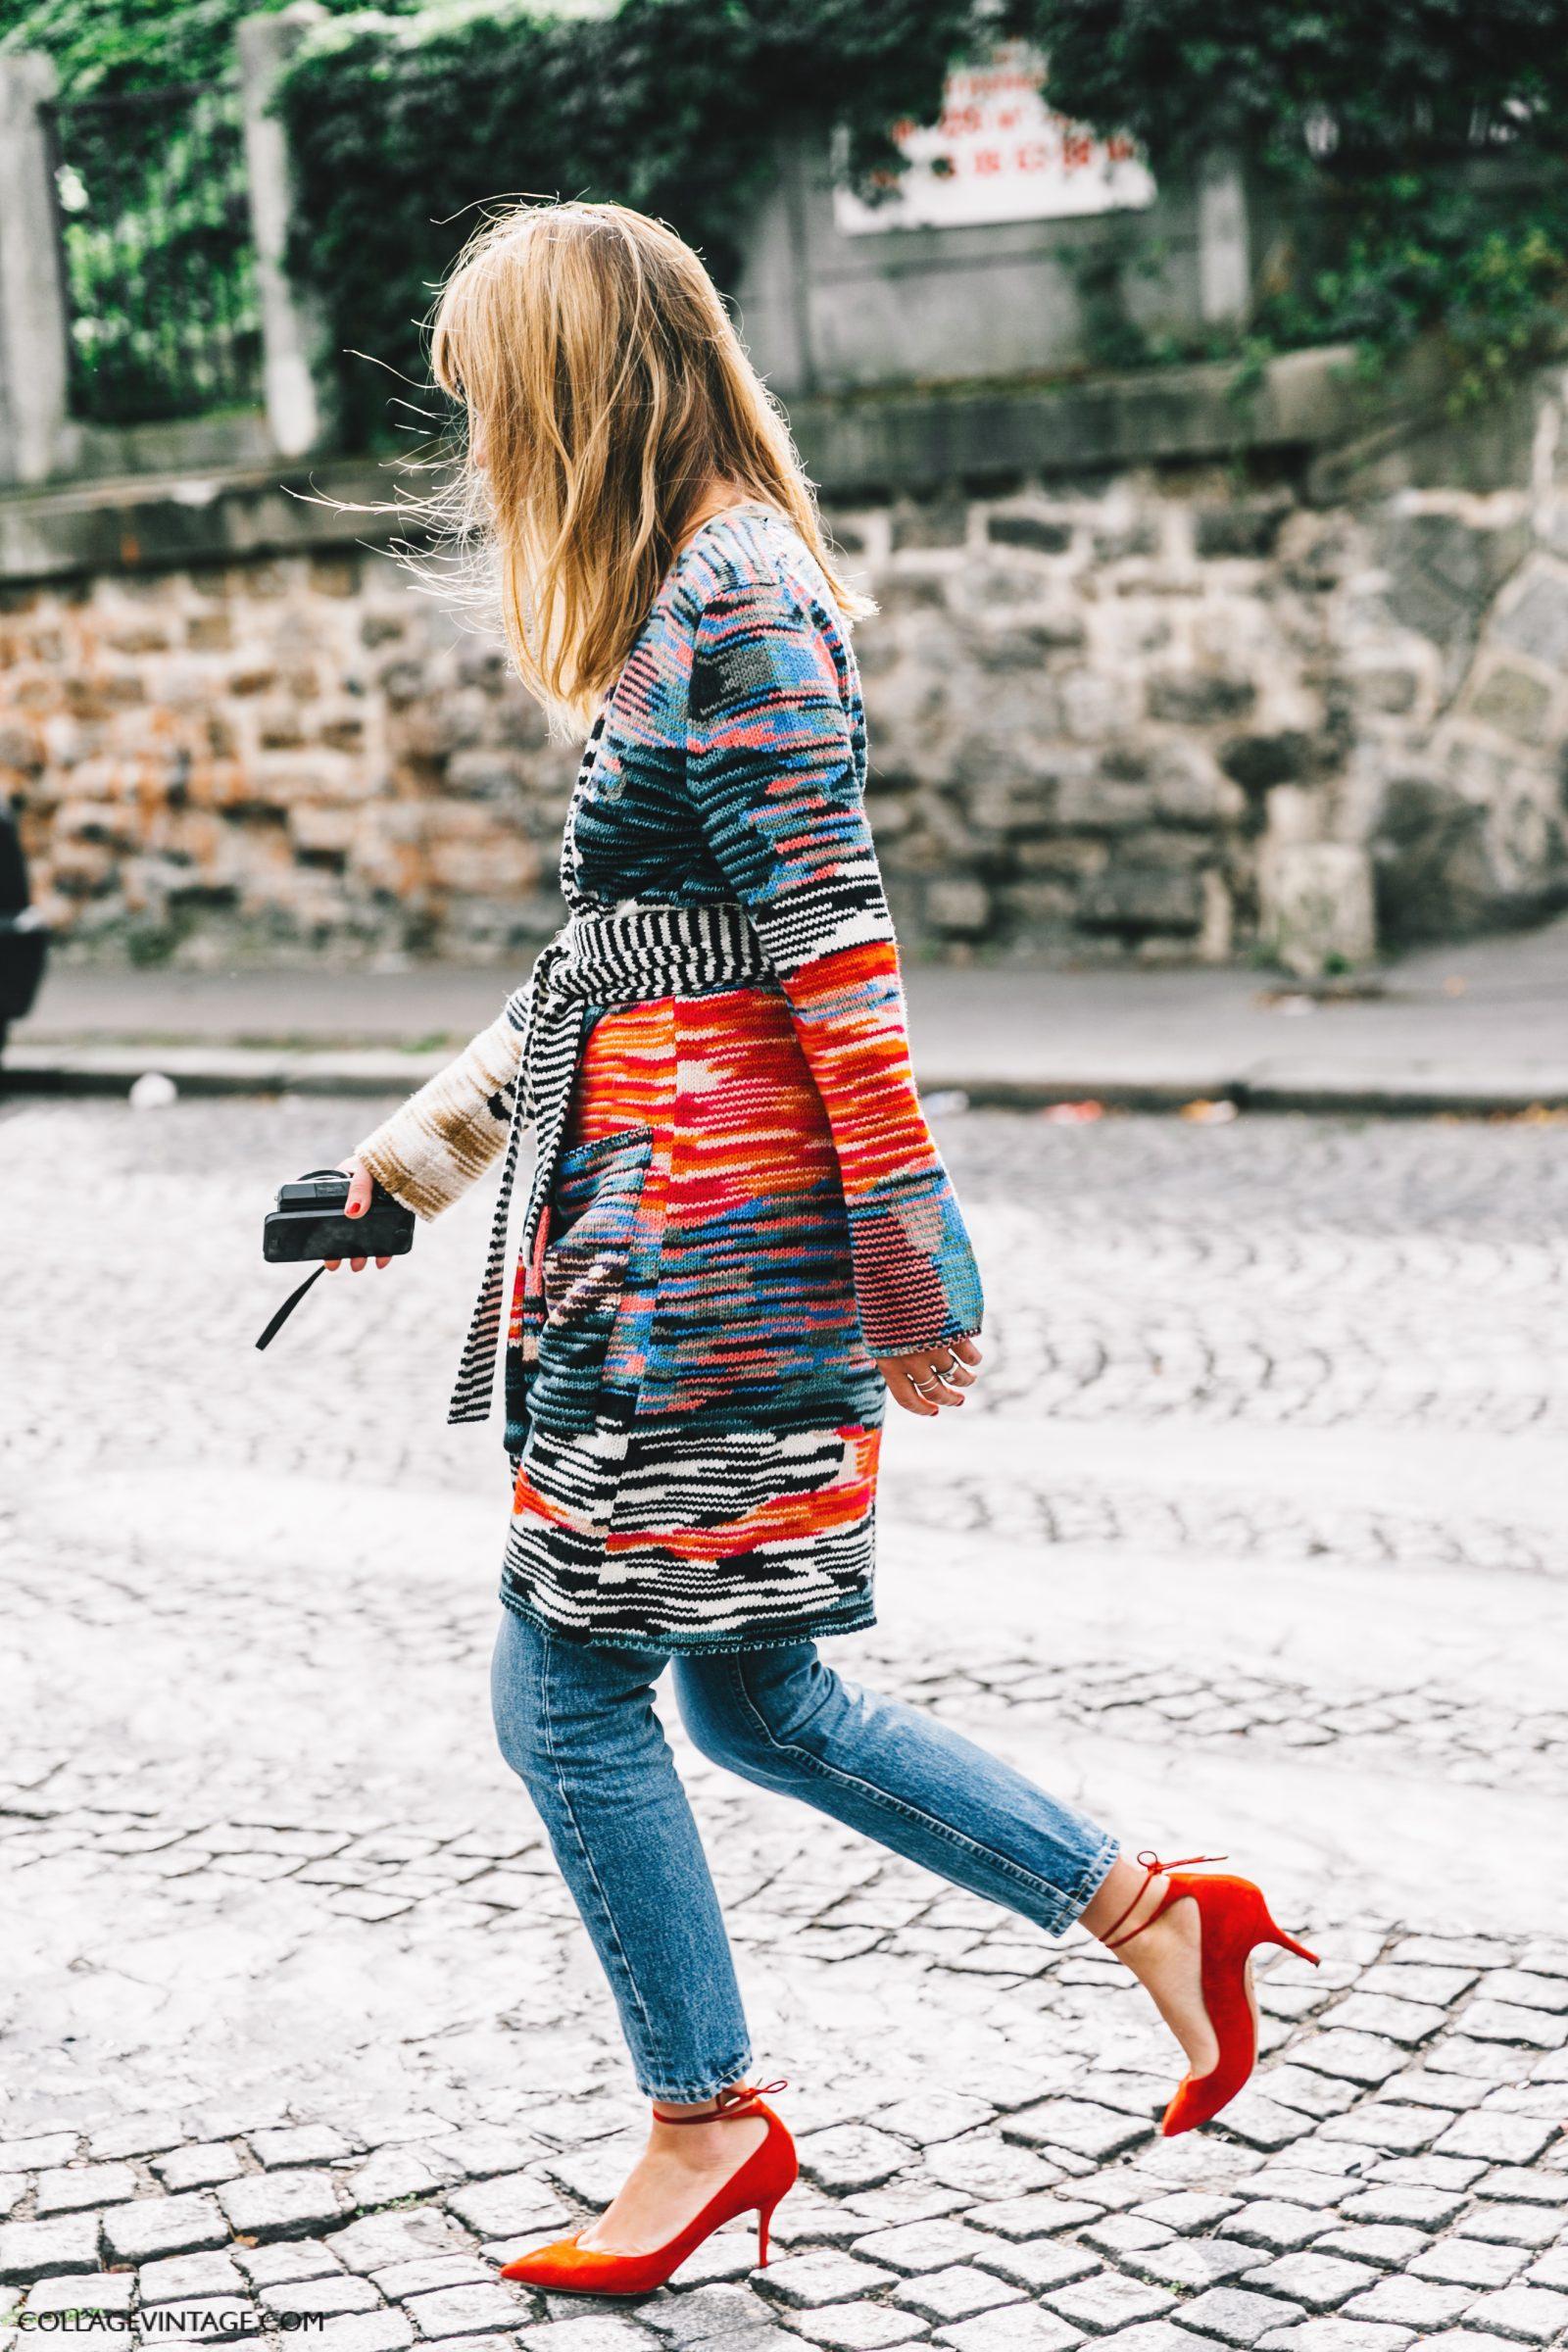 pfw-paris_fashion_week_ss17-street_style-outfits-collage_vintage-valentino-balenciaga-celine-31